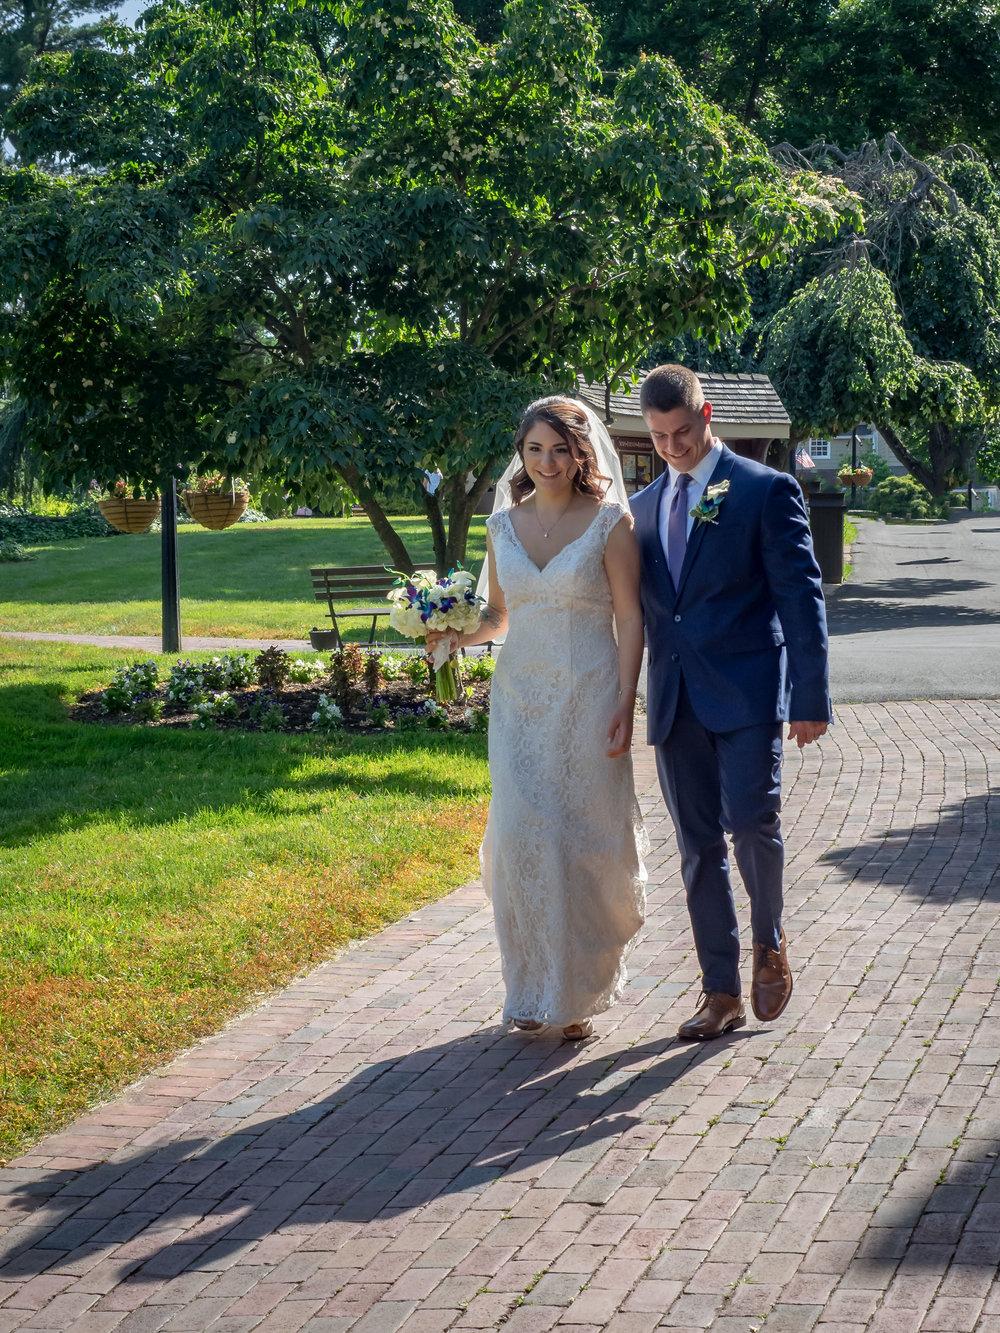 28 - Haines Couple - 20180616 - MLouis-67605.jpg